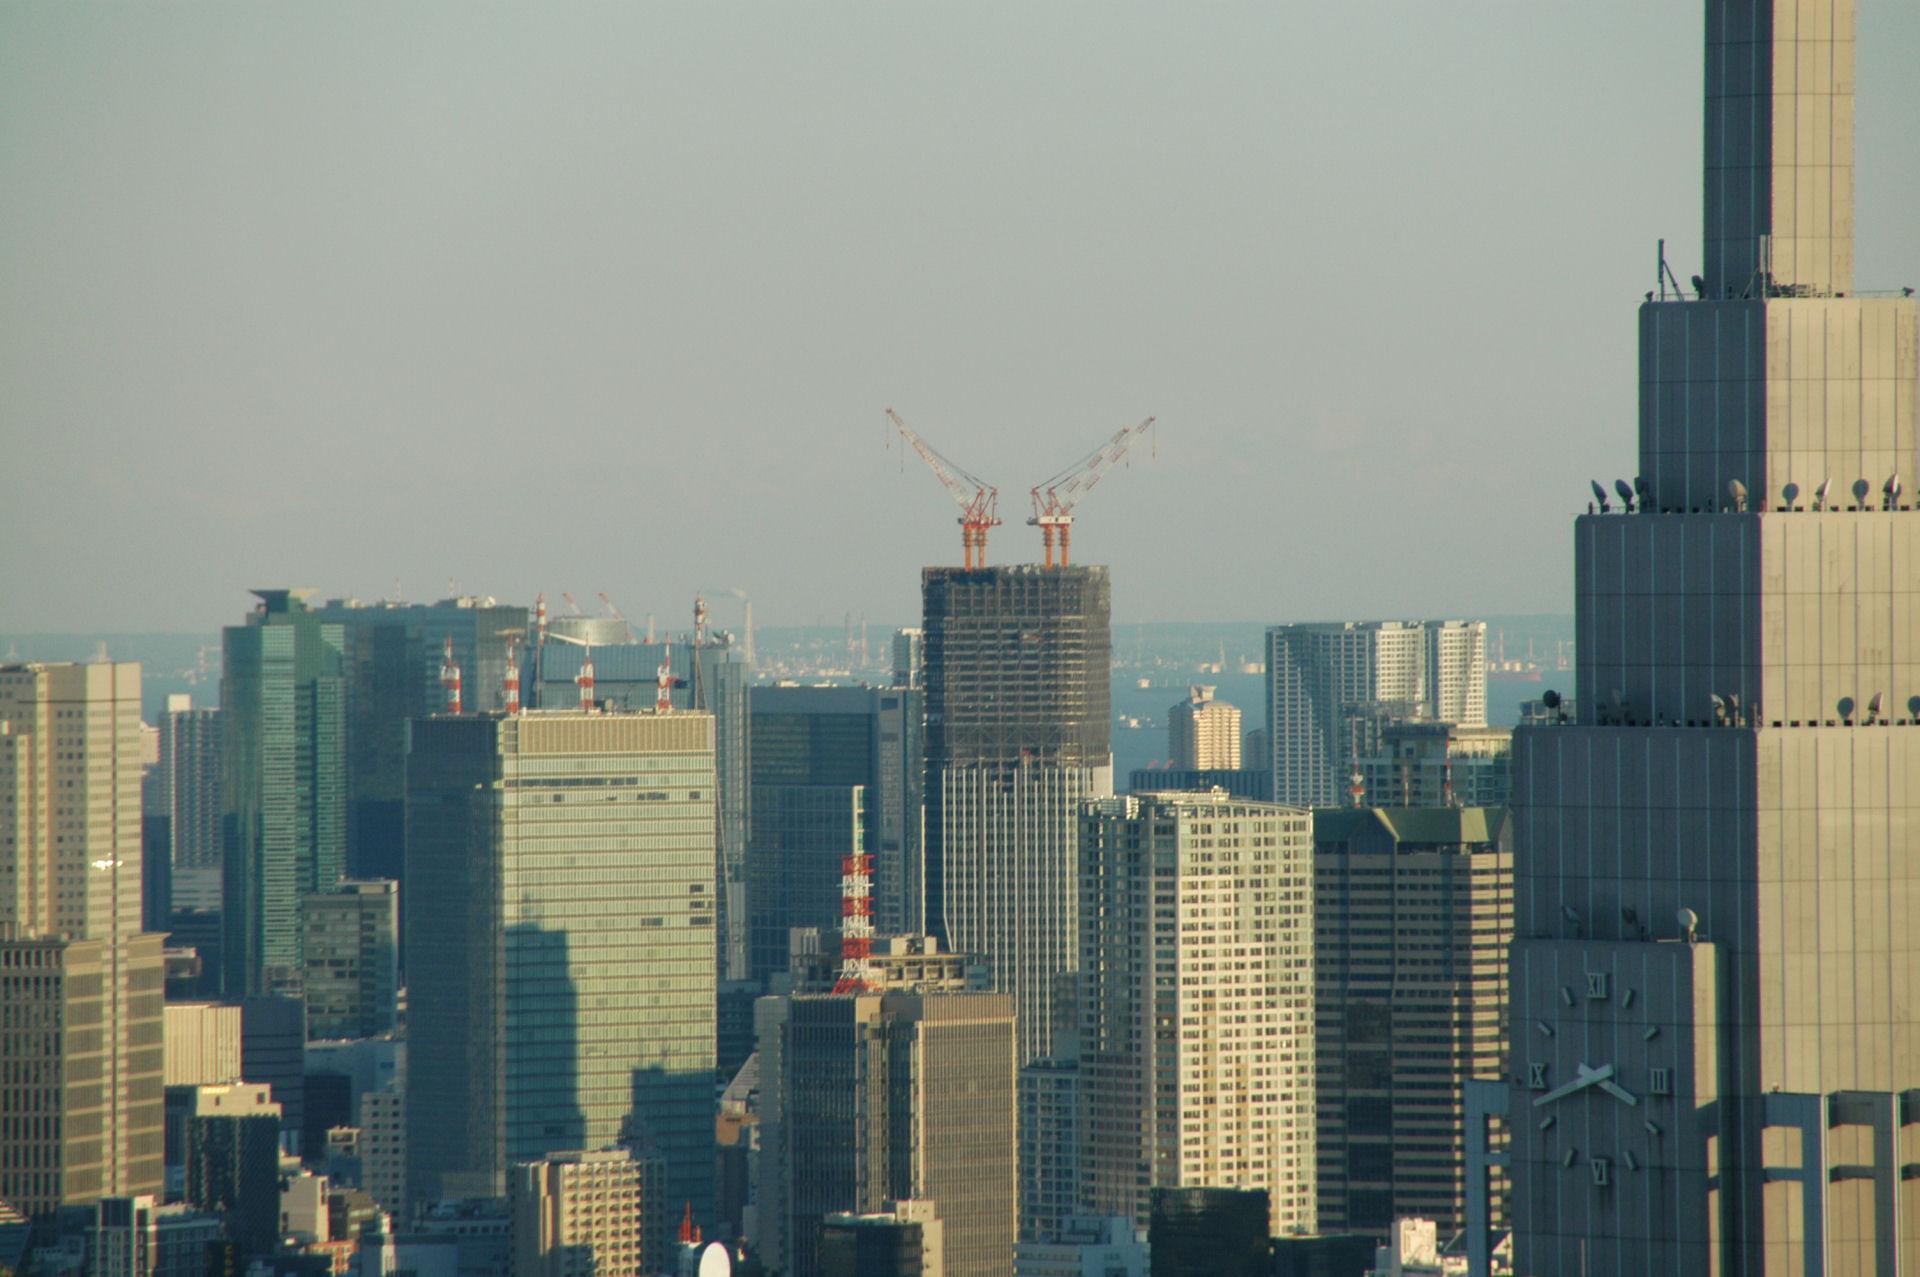 shintocho0164.jpg